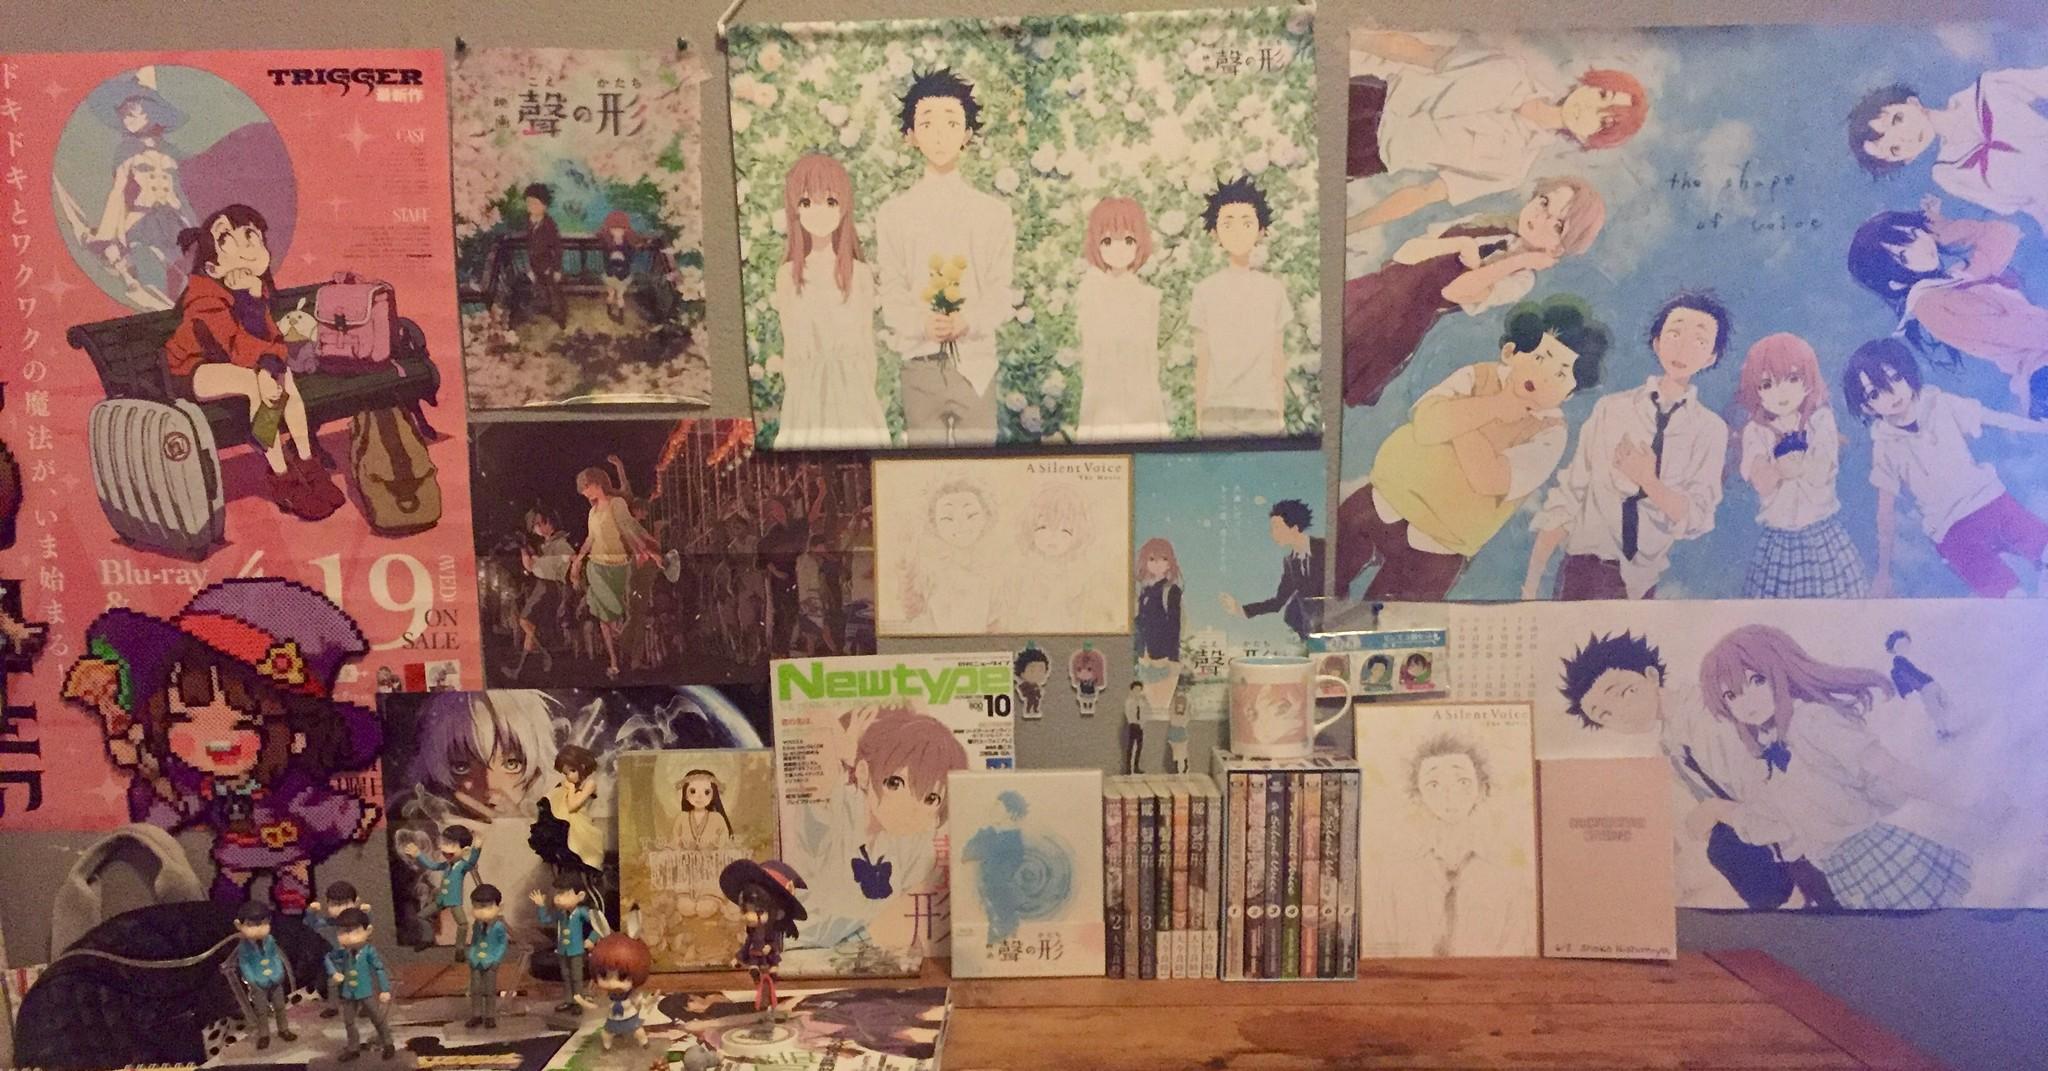 figma comics guts strap nendoroid good_smile_company trigger amazon tapestry nendoron koshinuma_shinji asai_(apsy)_masaki jun_(e.v.) kodansha kyoto_animation pony_canyon keyholder yoshinari_you wall_calendar blu-ray nakashima_kazuki shounen_magazine_comics iguchi_shinya yamada_naoko kill_la_kill acrylic_charm little_witch_academia mankanshoku_mako iphone_5s_case koe_no_katachi ooima_yoshitoki playful_mind_company atsuko_kagari wooden_strap iphone_6_plus_case caravan nishimiya_shouko orange_rouge notebook_type_smartphone_case lawson_hmv_entertainment iphone_6s_case osomatsu-san matsuno_todomatsu matsuno_ichimatsu matsuno_karamatsu matsuno_osomatsu matsuno_choromatsu akatsuka_fujio standing_acrylic_keychain matsuno_jyushimatsu wood_keychain ishida_shouya